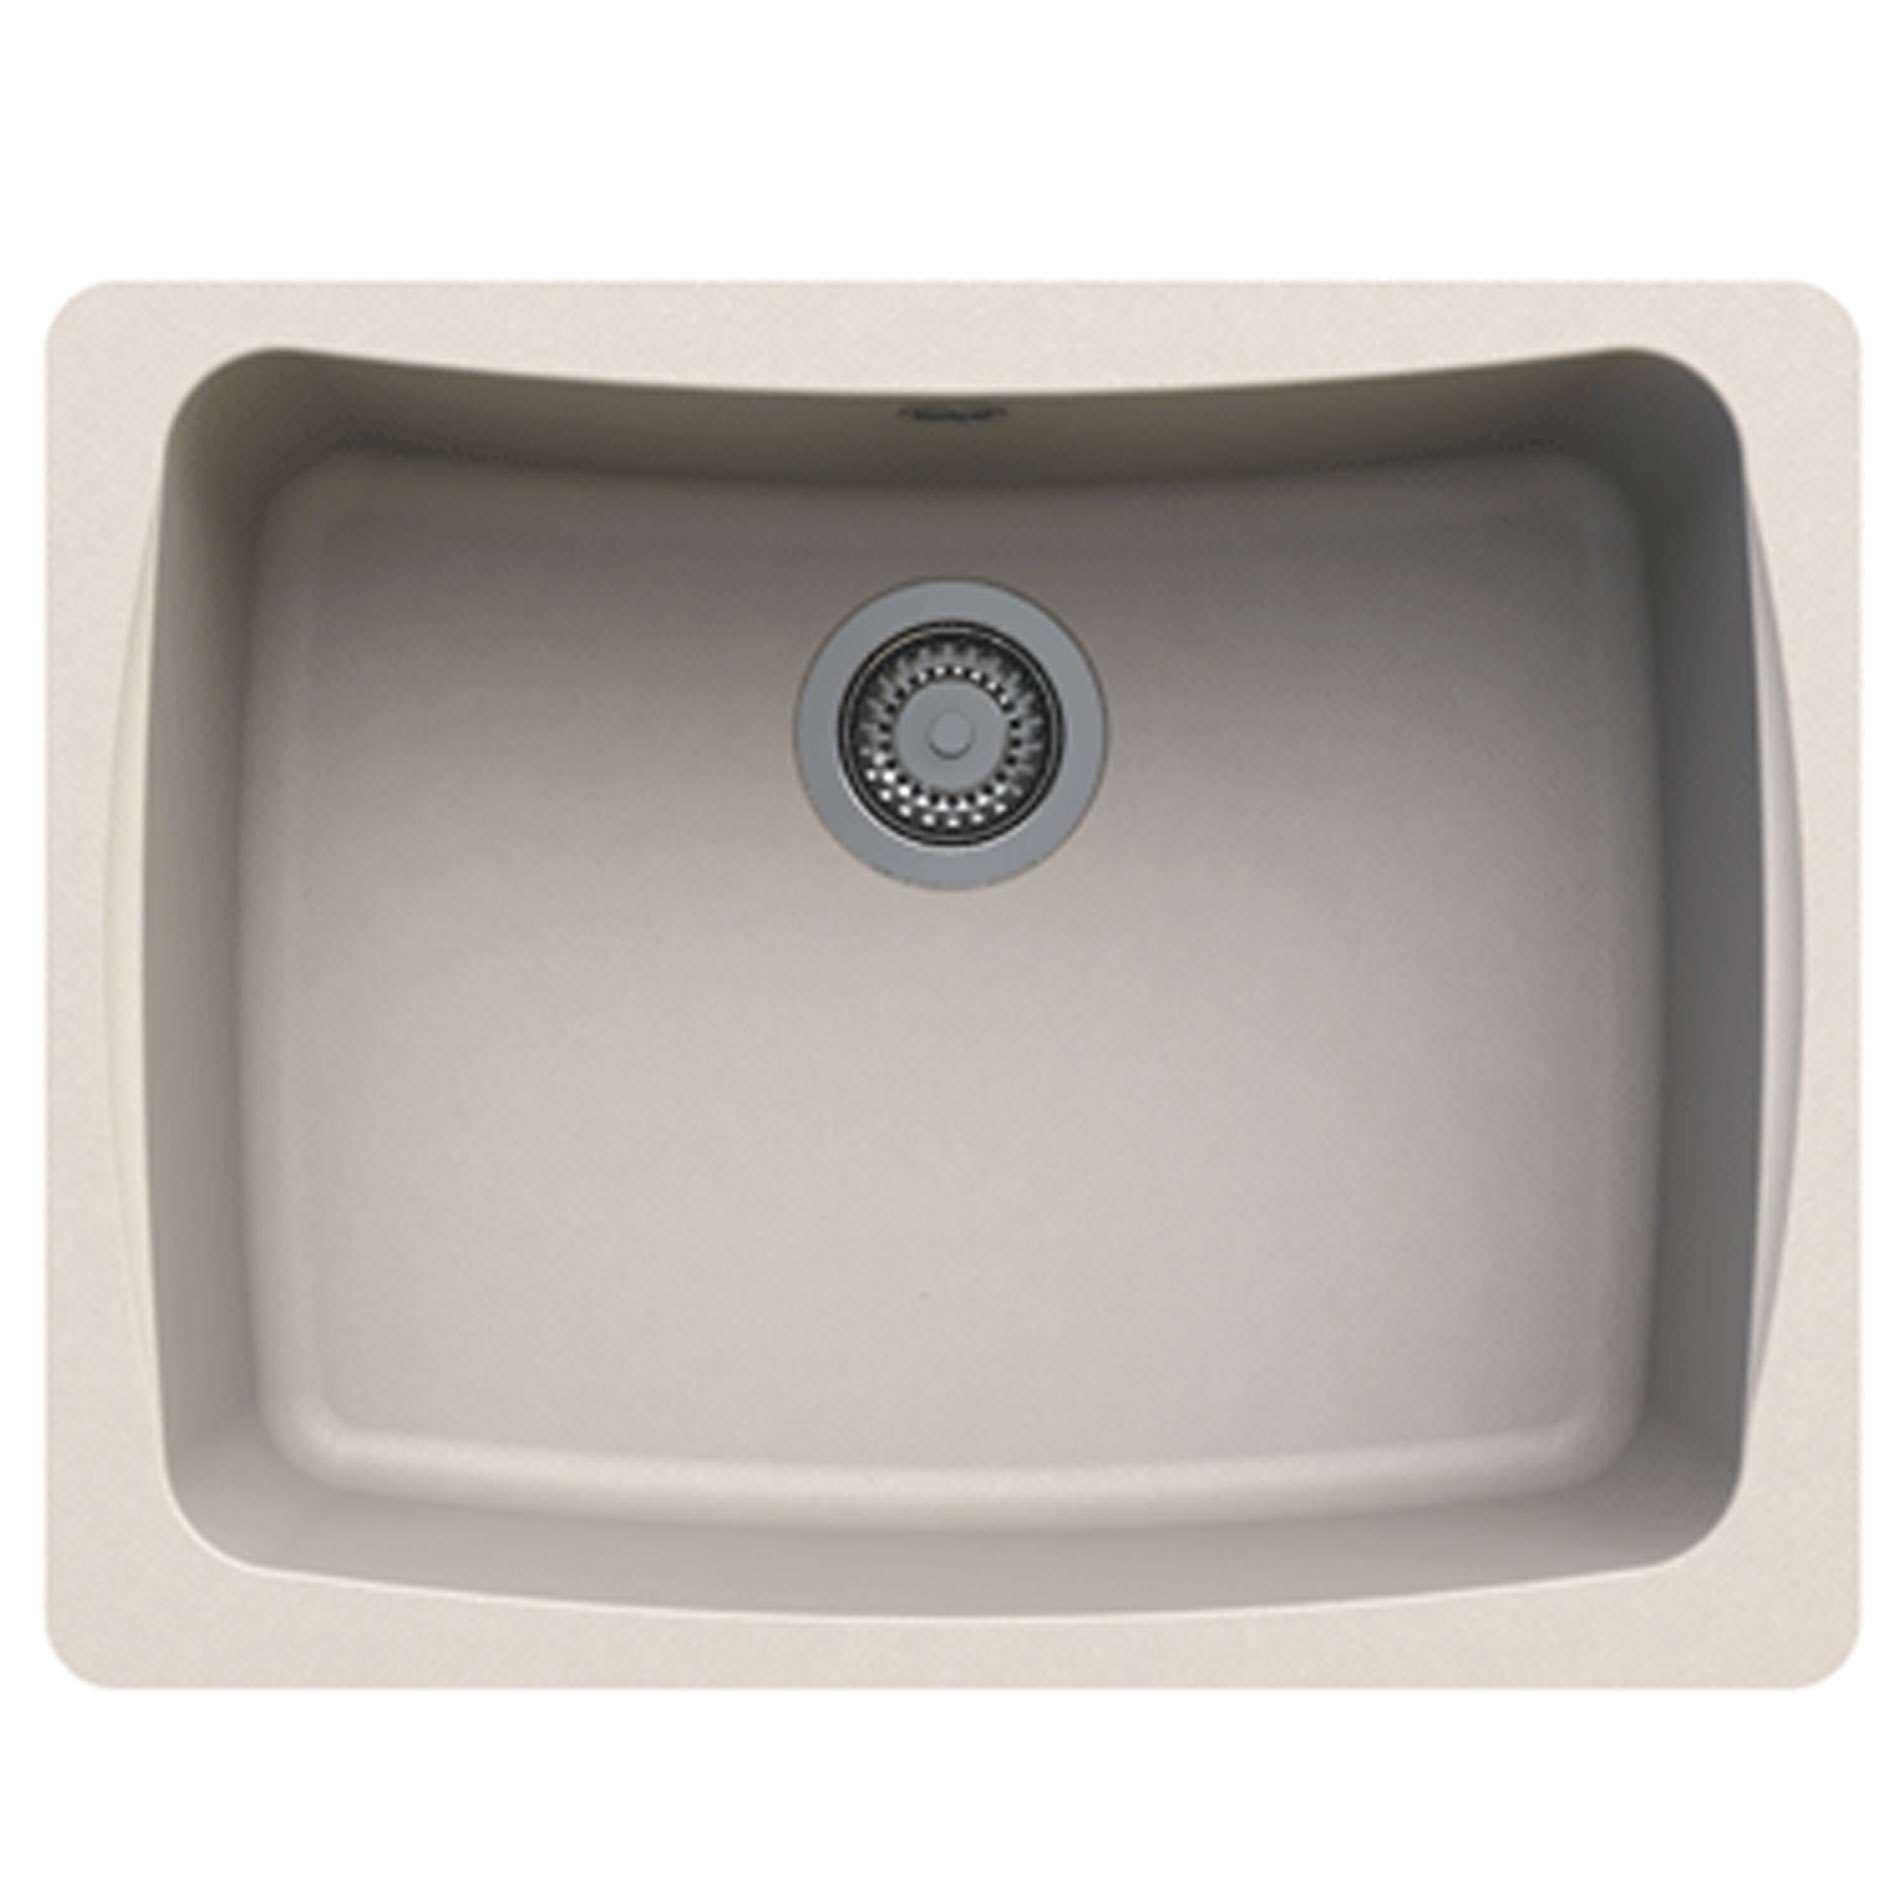 Rok Granite Sinks : ... Malham 1.0 Bowl Sahara Beige ROK Granite Sink - Kitchen Sinks & Taps